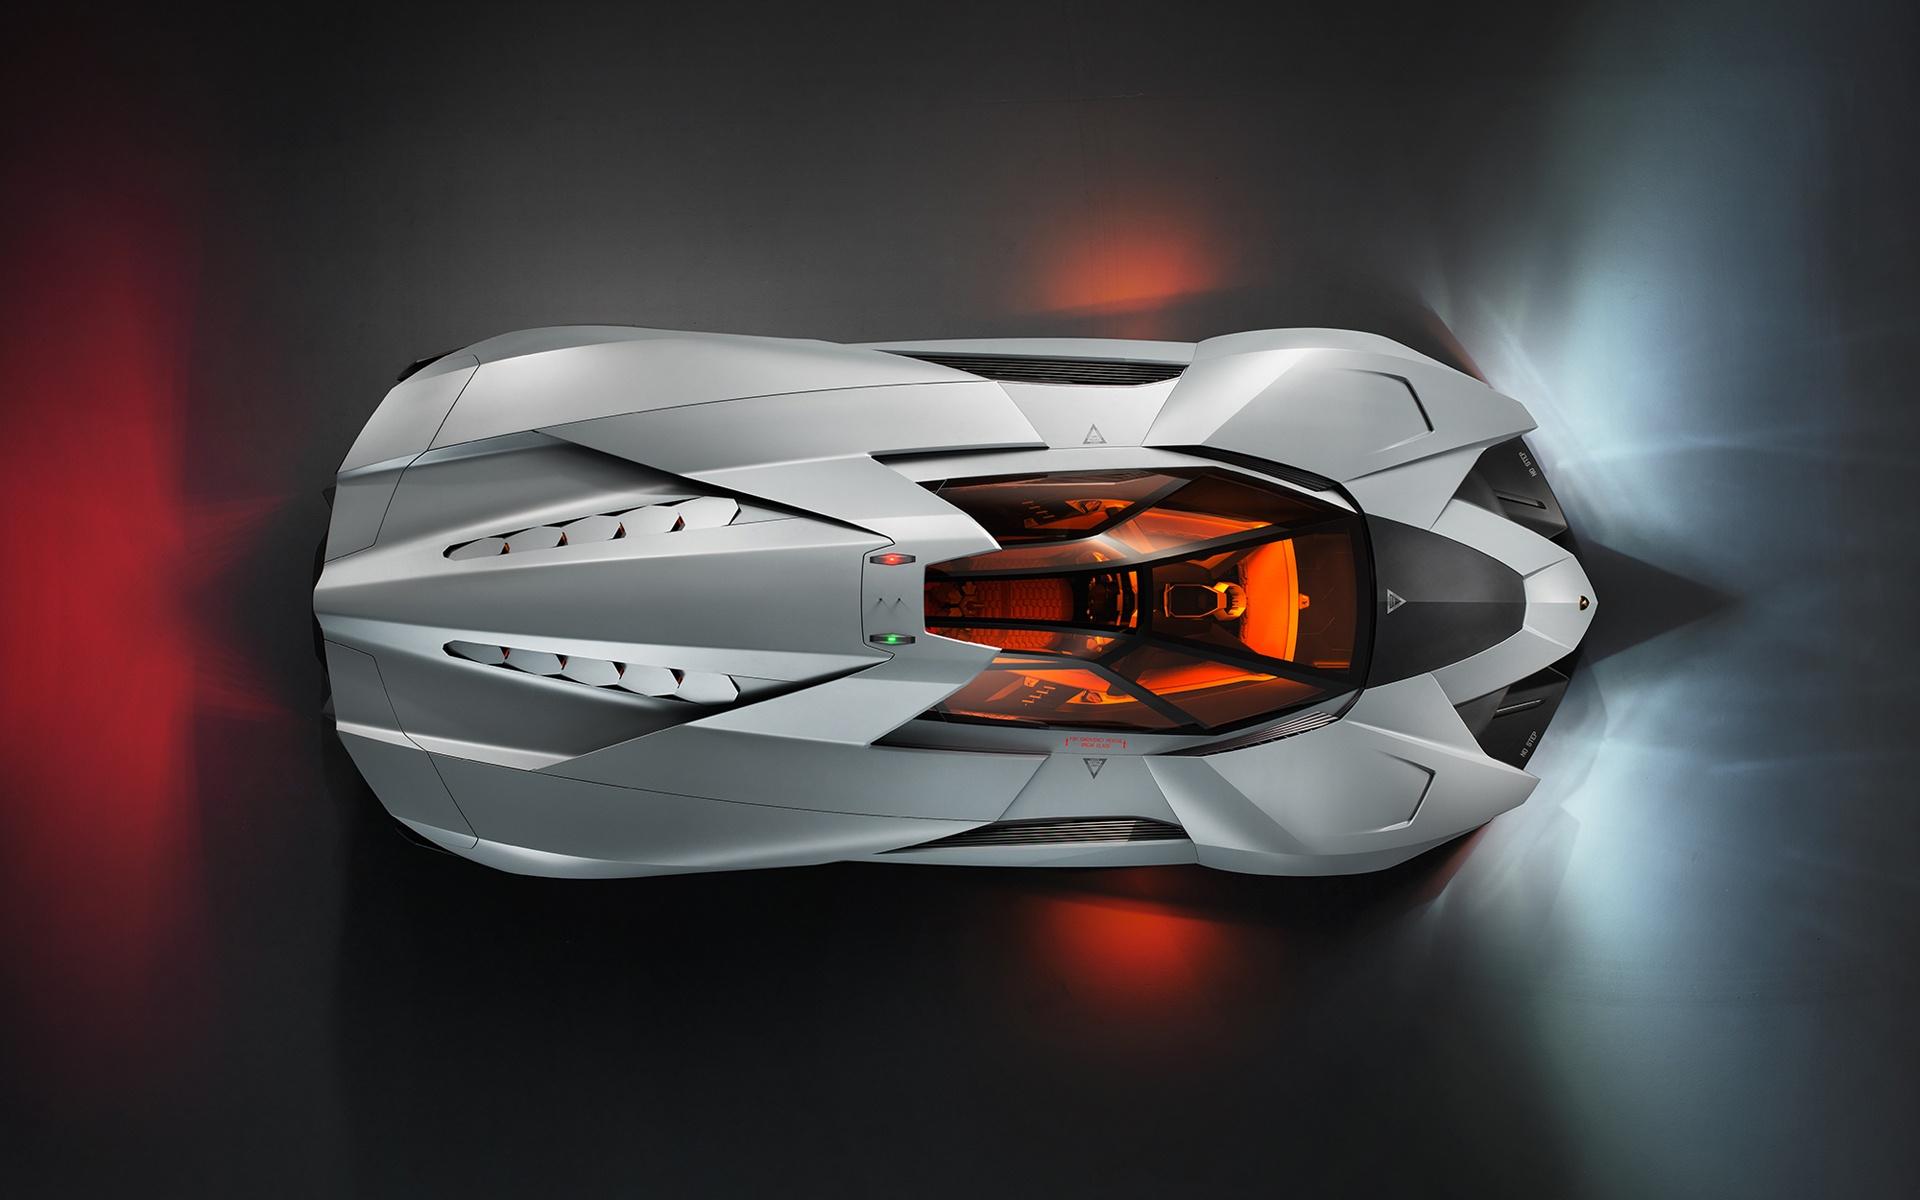 Wallpaper Lamborghini Egoista Sport Car Top View 1920x1200 Hd